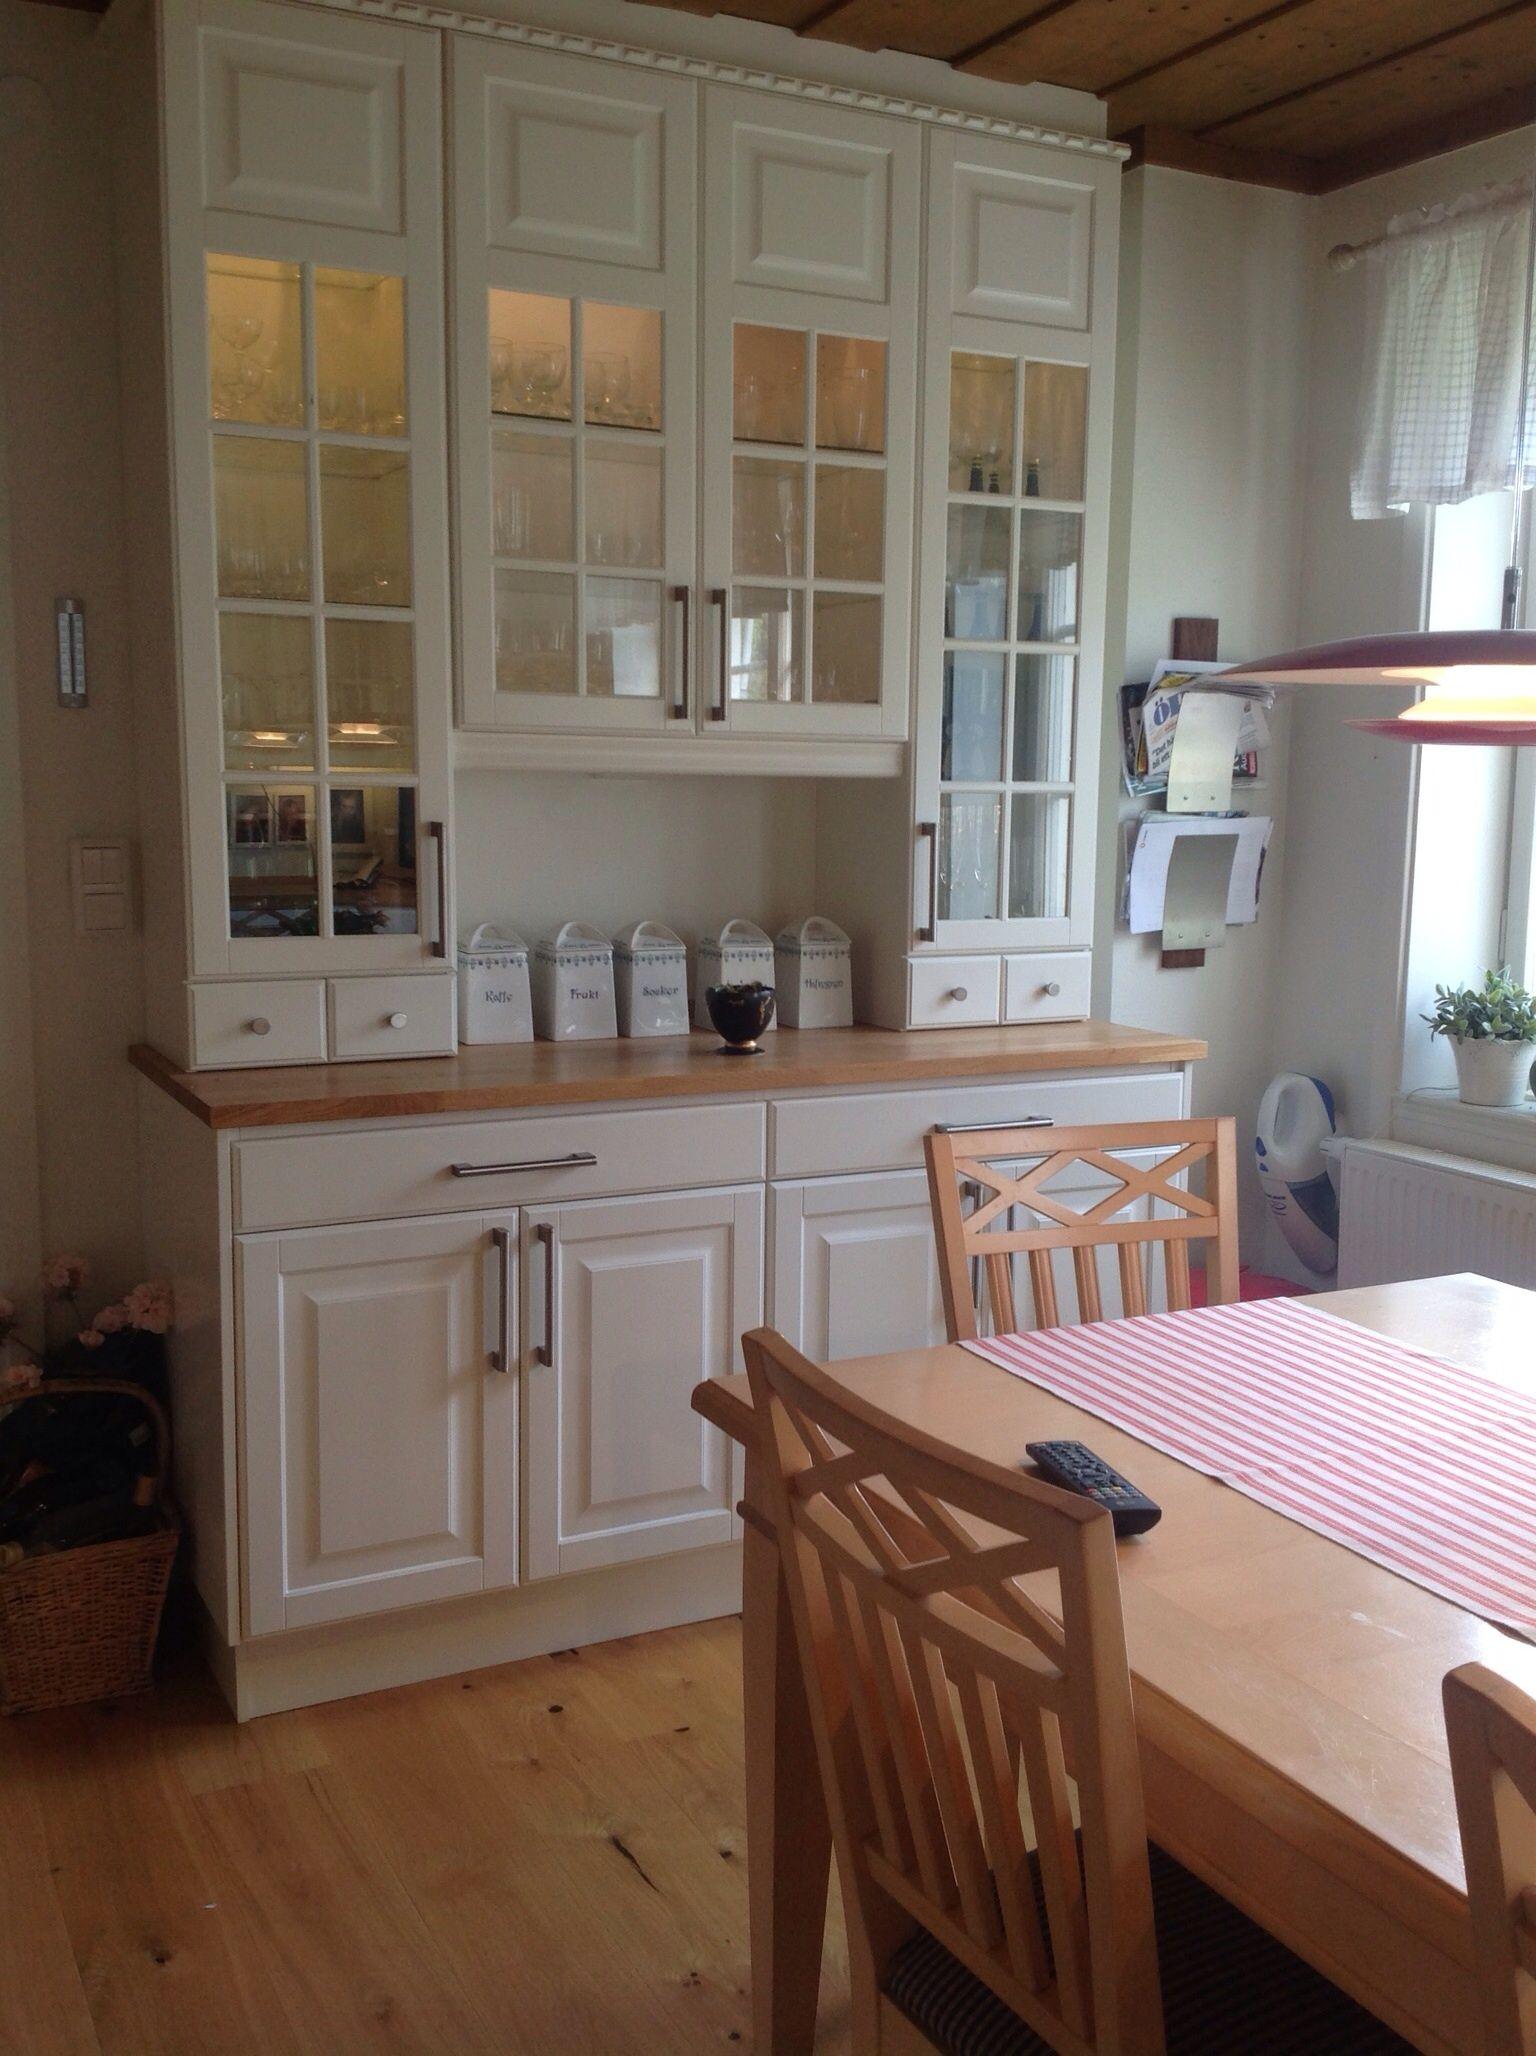 Kitchen Ikea bodbyn kitchen, Kitchen furniture, Home